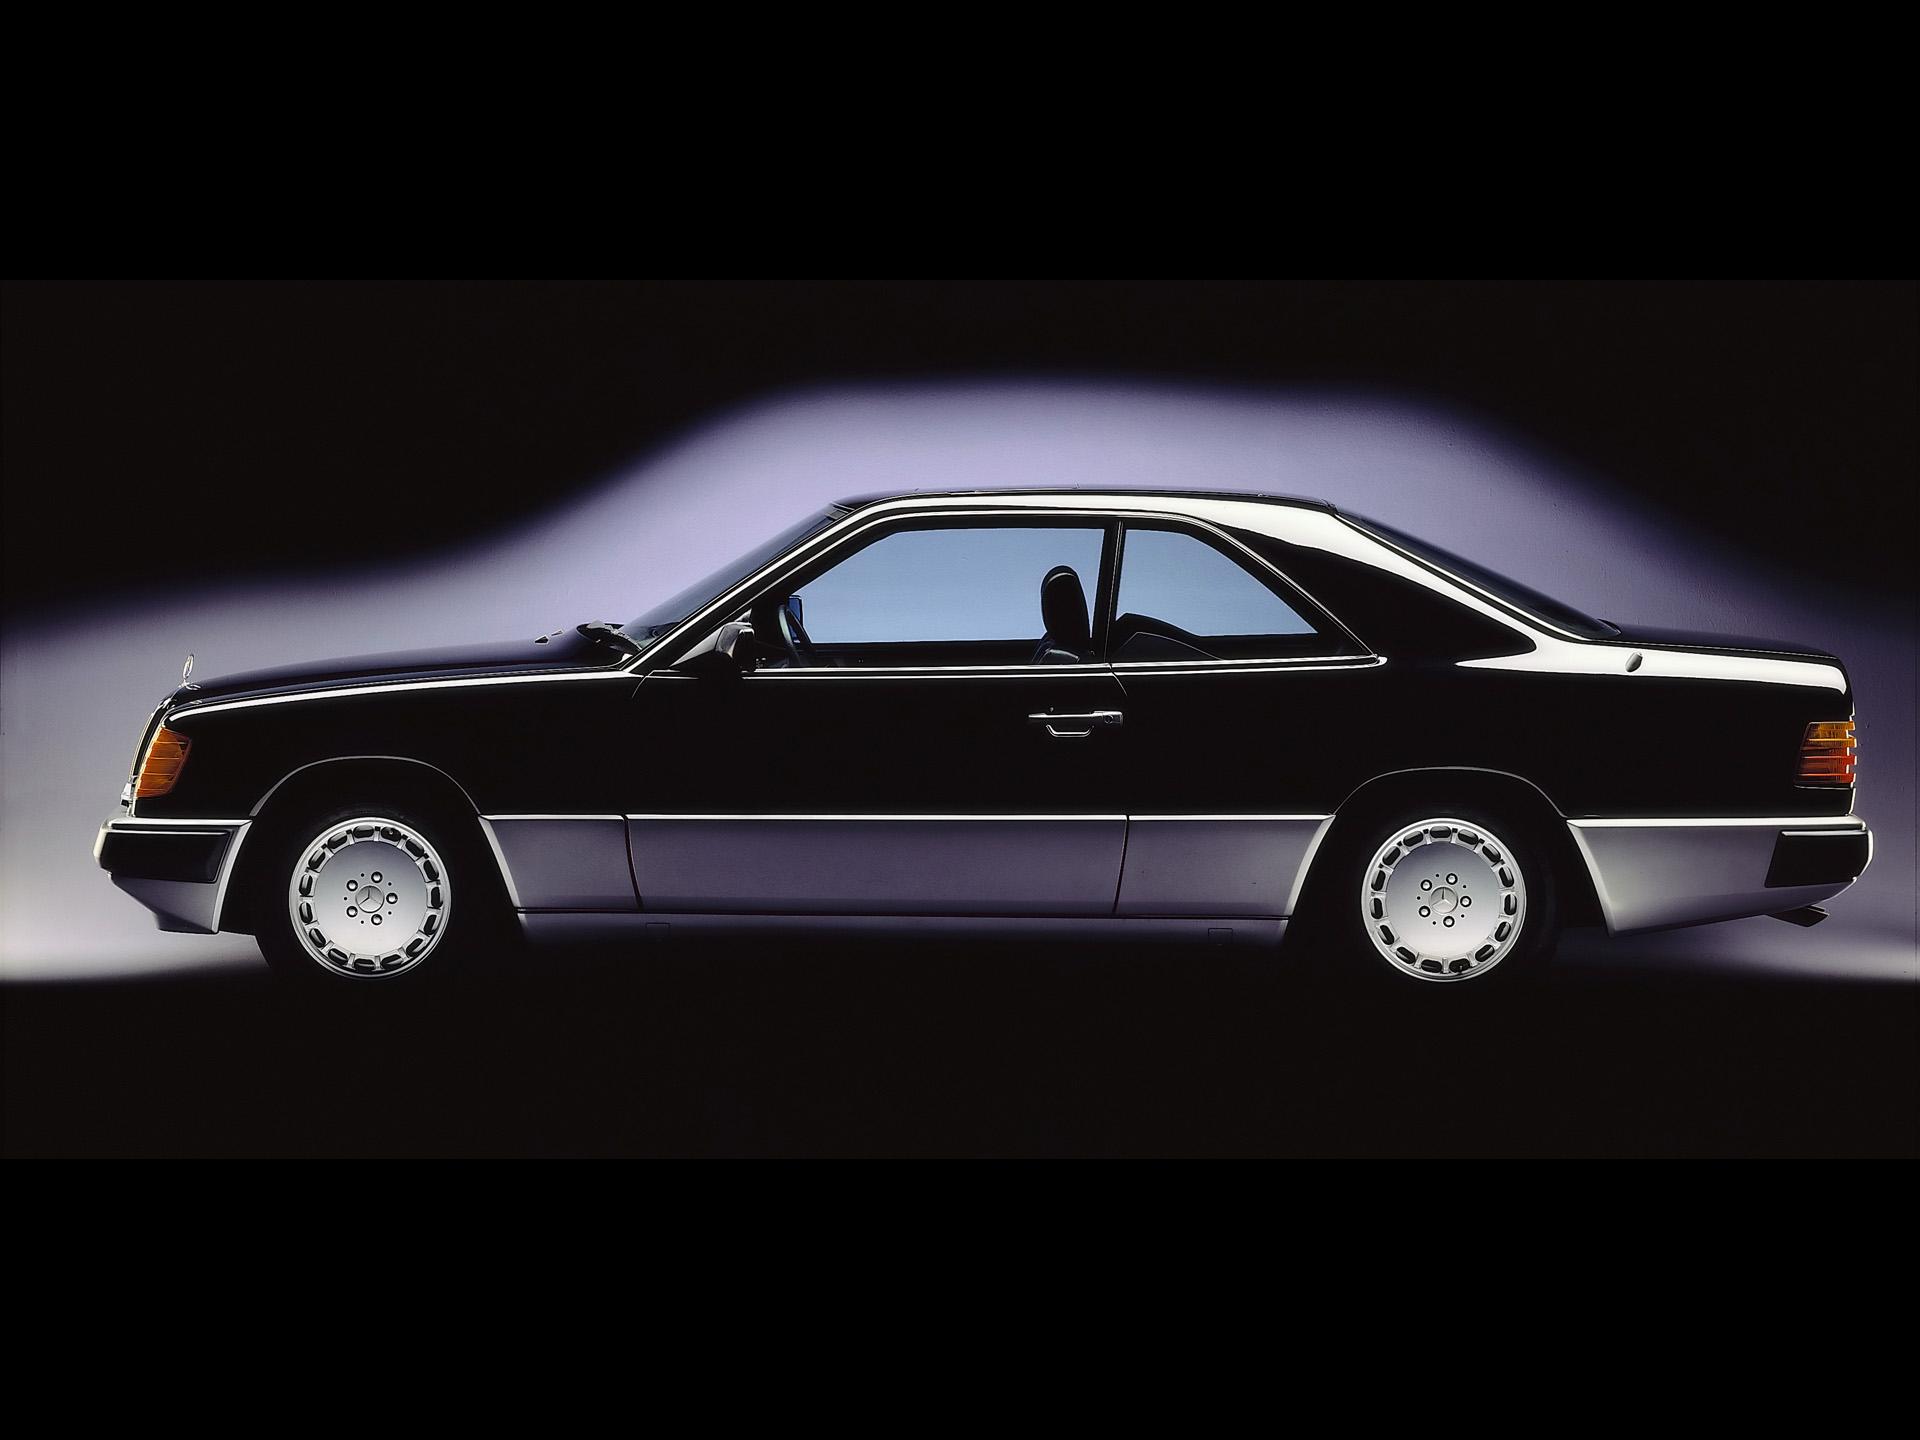 1996 mercedes benz e class image 9 for Mercedes benz 1996